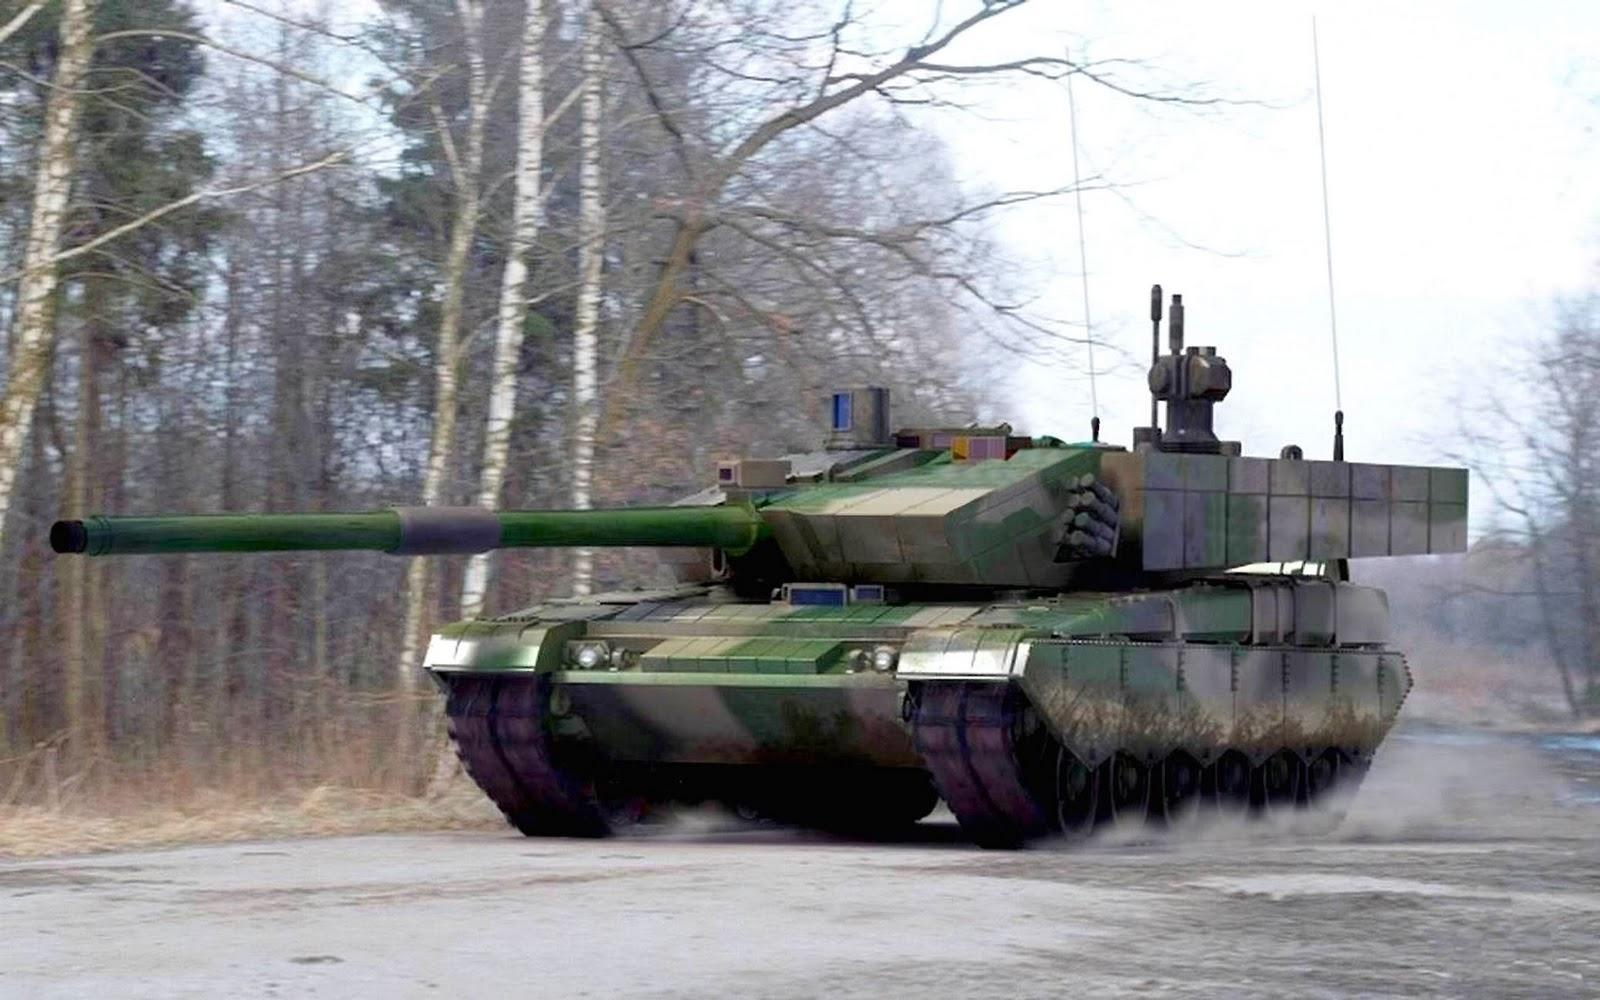 Chimera, Conversion, Imperial Guard, Kitbash, Panzer, Tank